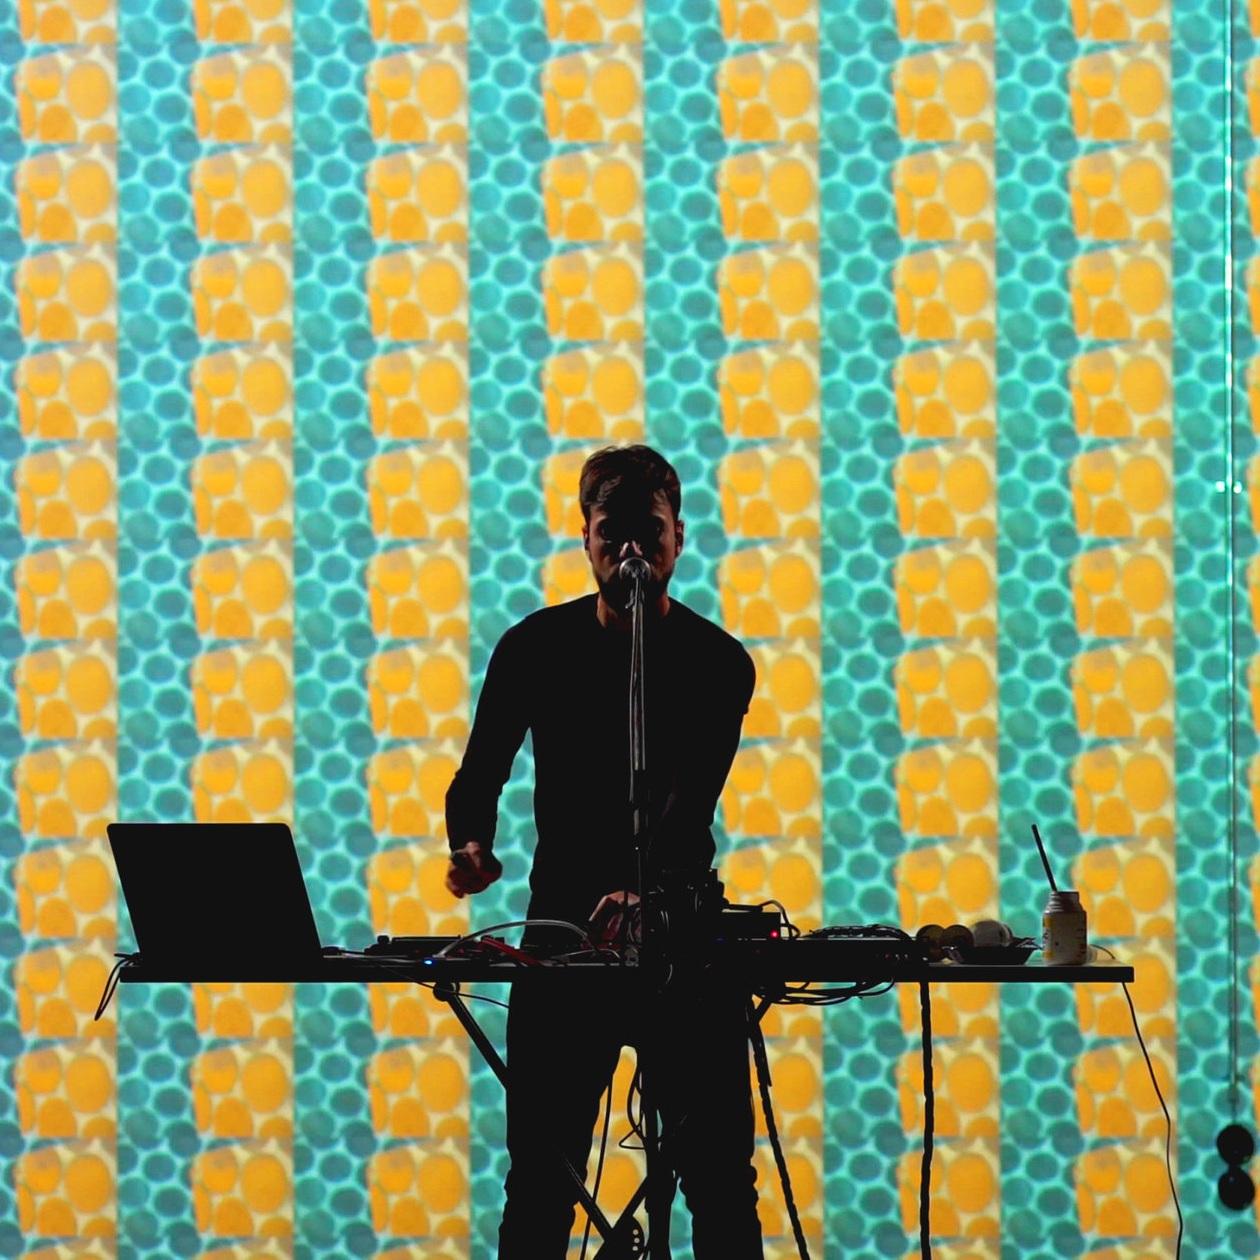 Diego Ain - Ain TheMachine - AudioVisual StoryTeller